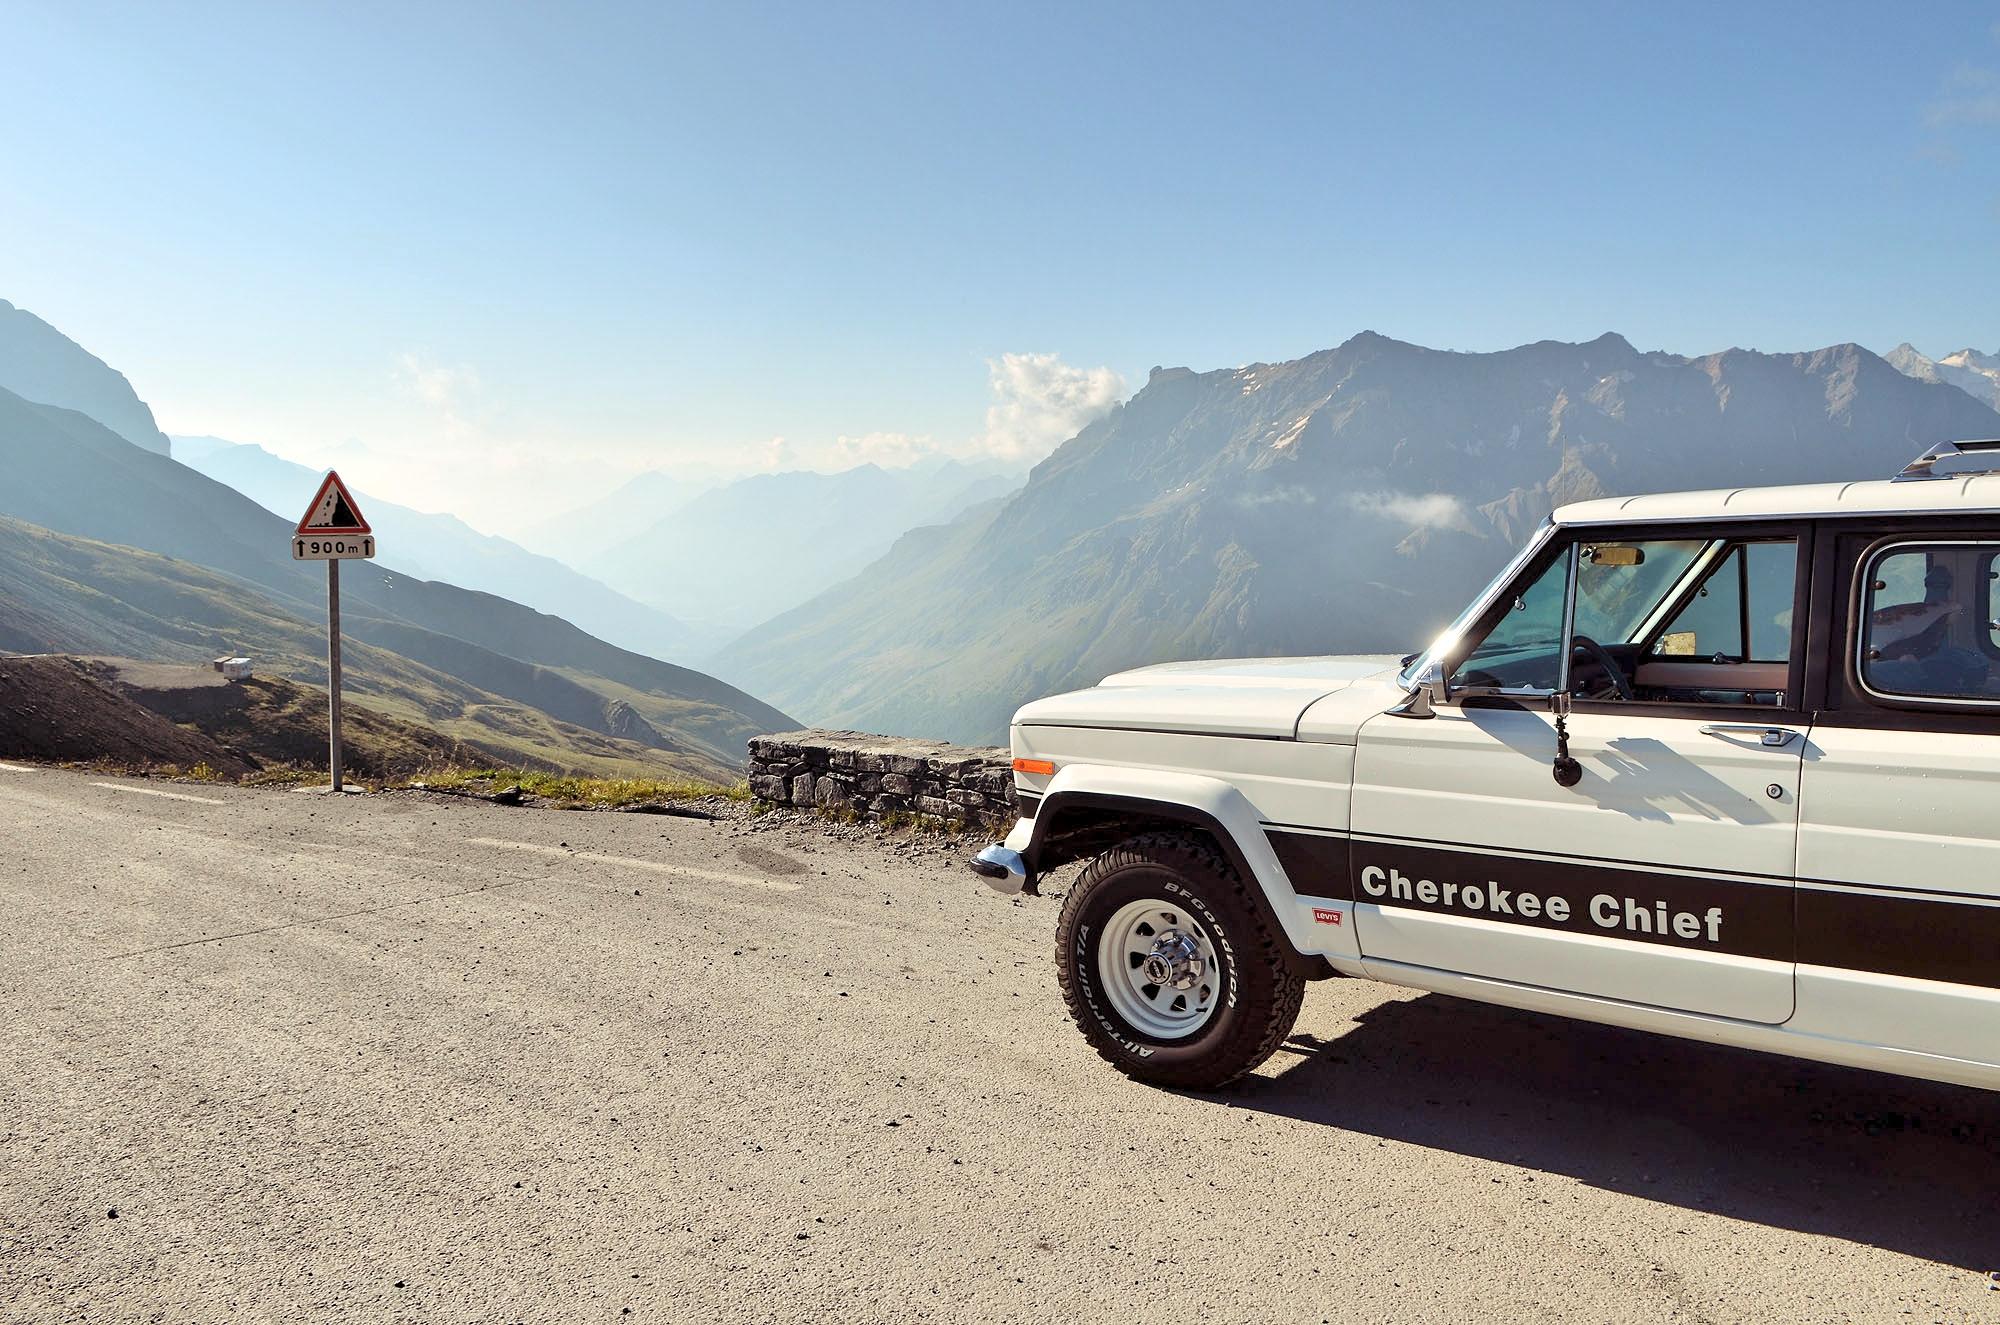 jeep-cherokee-chief-valloire-103.JPG